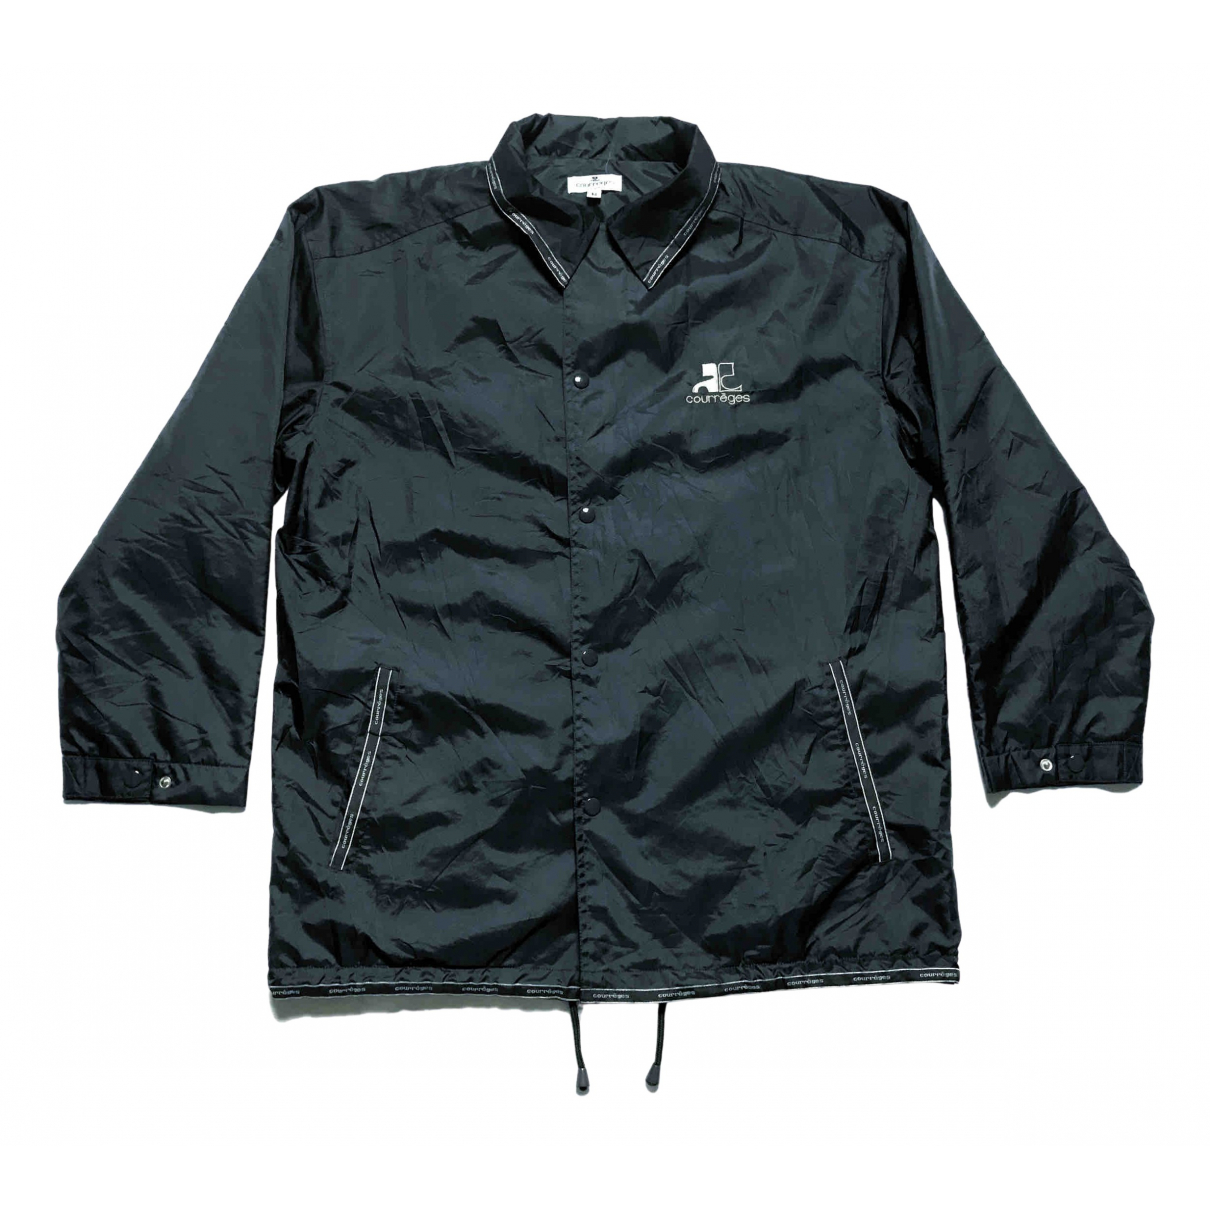 Courreges \N Jacke in  Schwarz Polyester